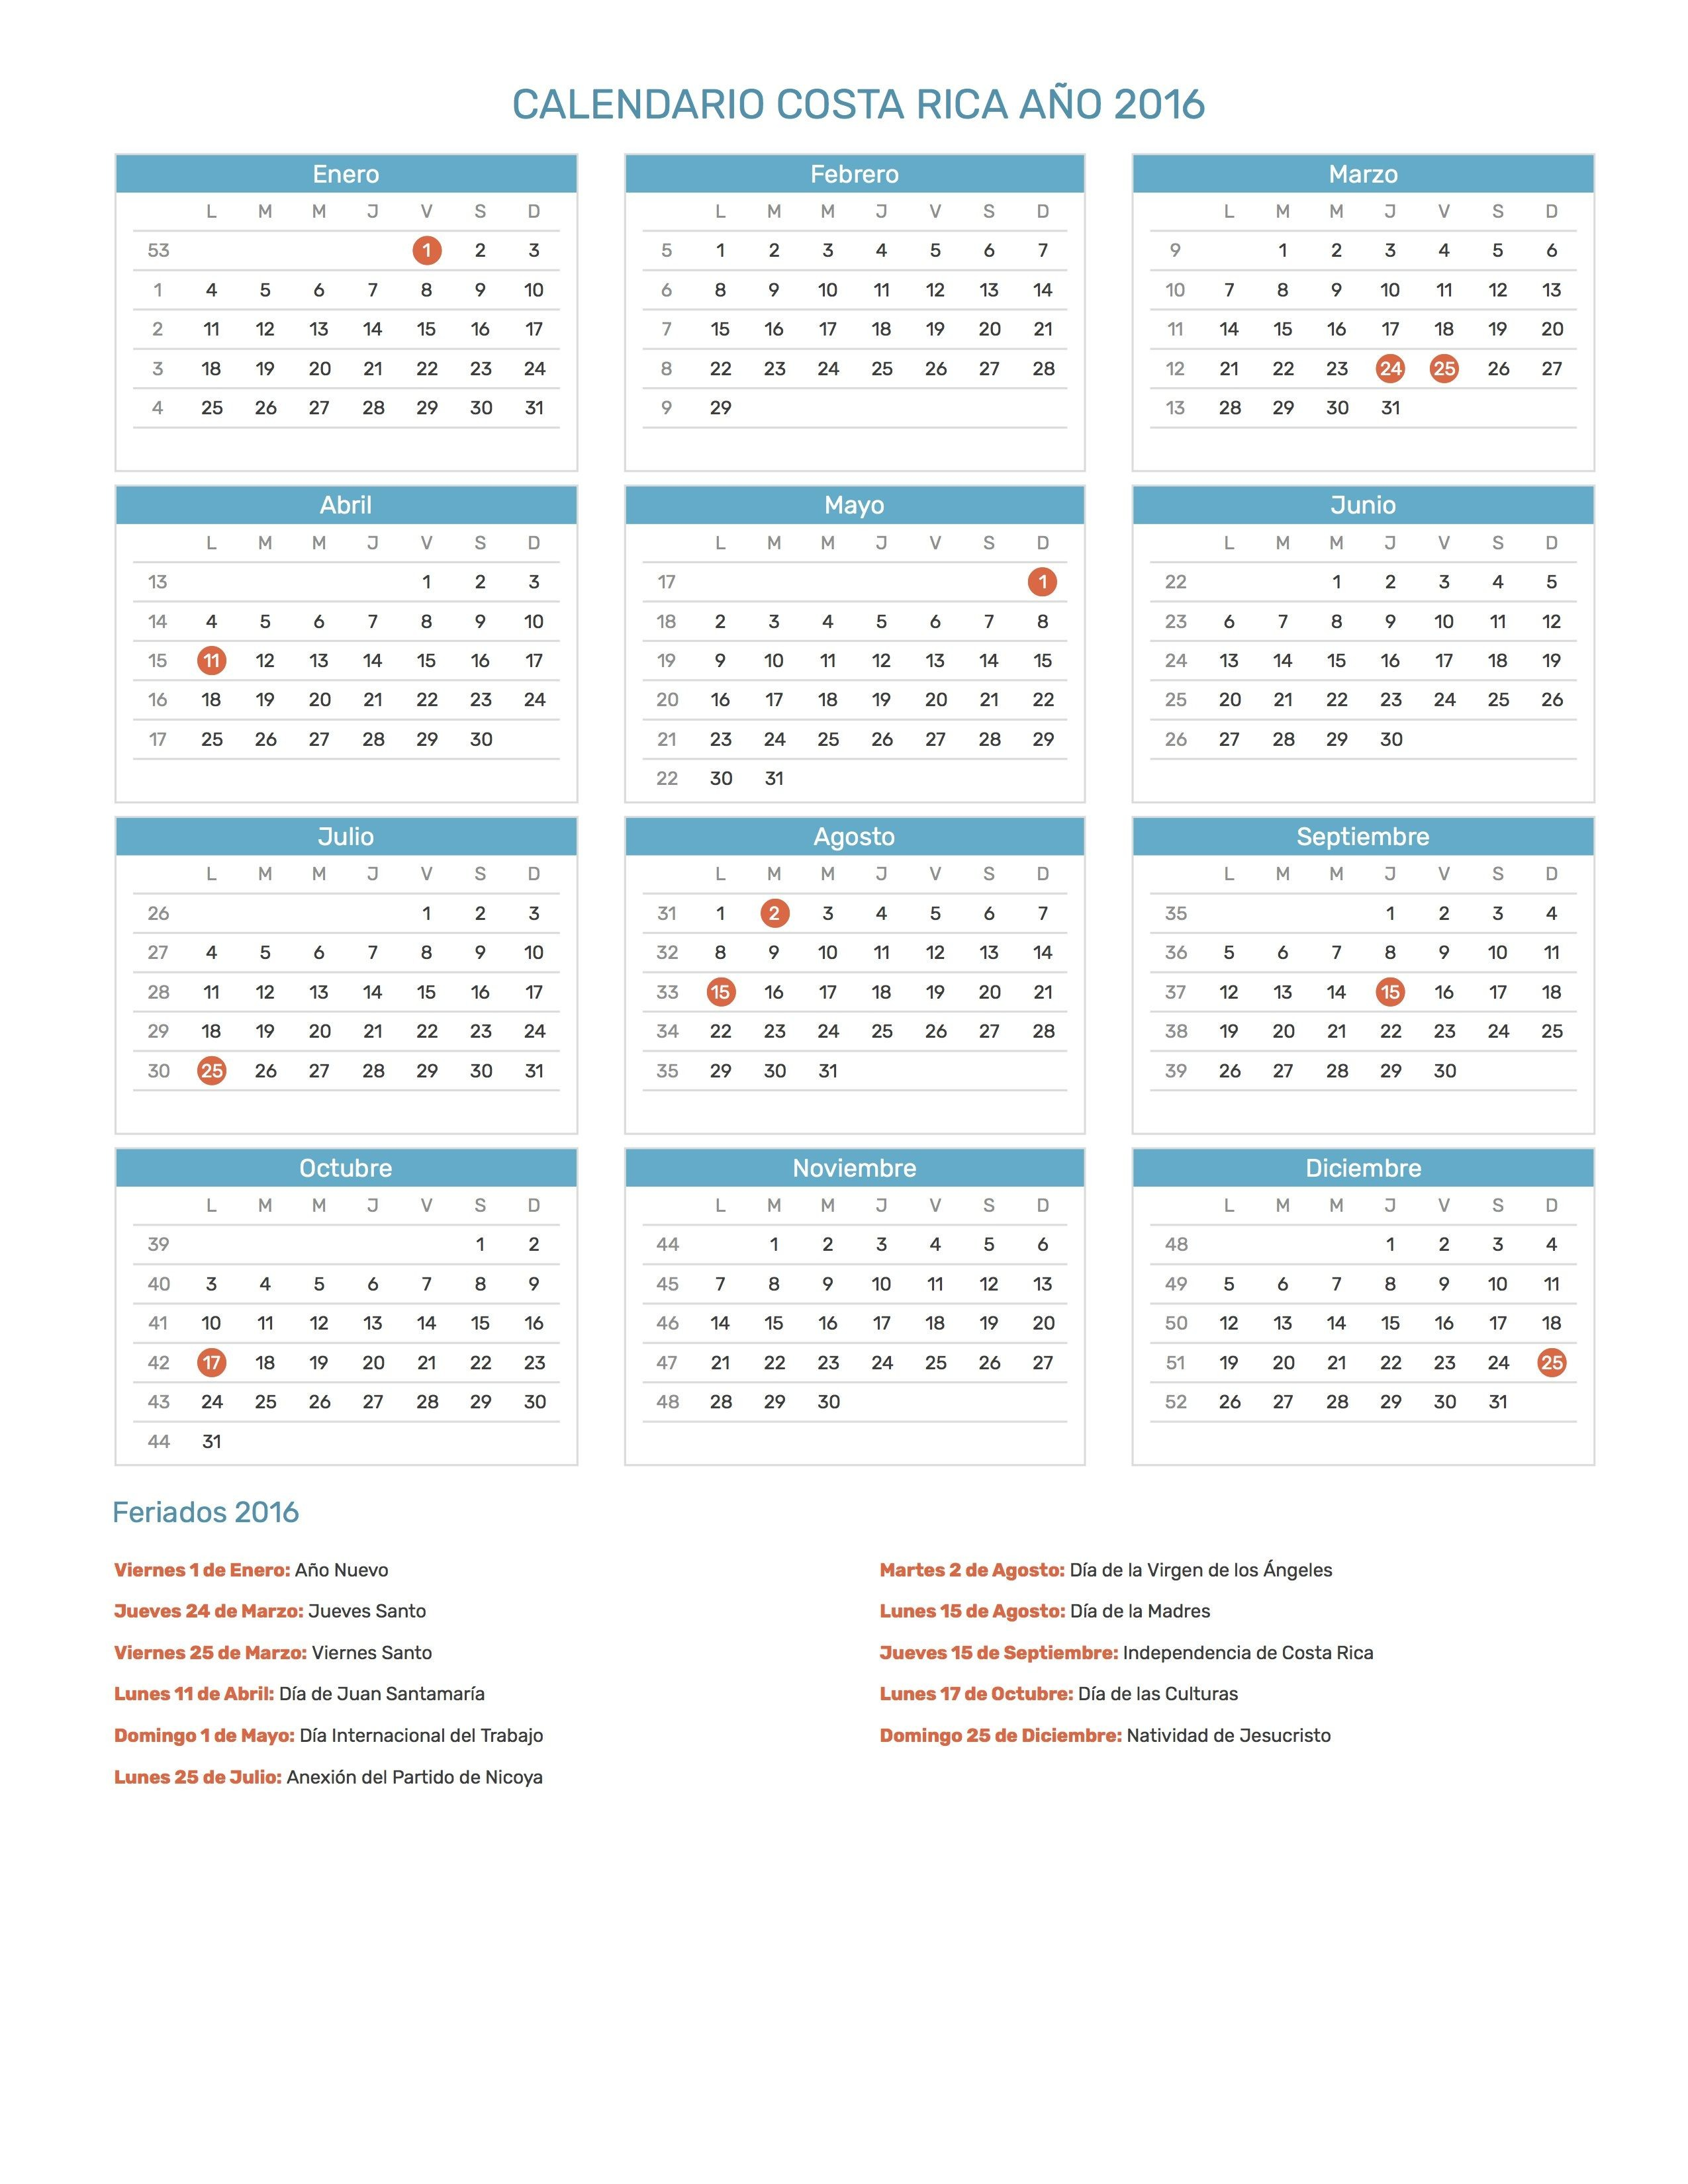 Calendario 2017 De Mesa Para Imprimir Com Feriados Más Populares Pin De Calendario Hispano En Calendario Con Feriados A±o 2016 Of Calendario 2017 De Mesa Para Imprimir Com Feriados Más Arriba-a-fecha Secci³n Sindical Ugt Carrefour Pe±acastillo Septiembre 2015